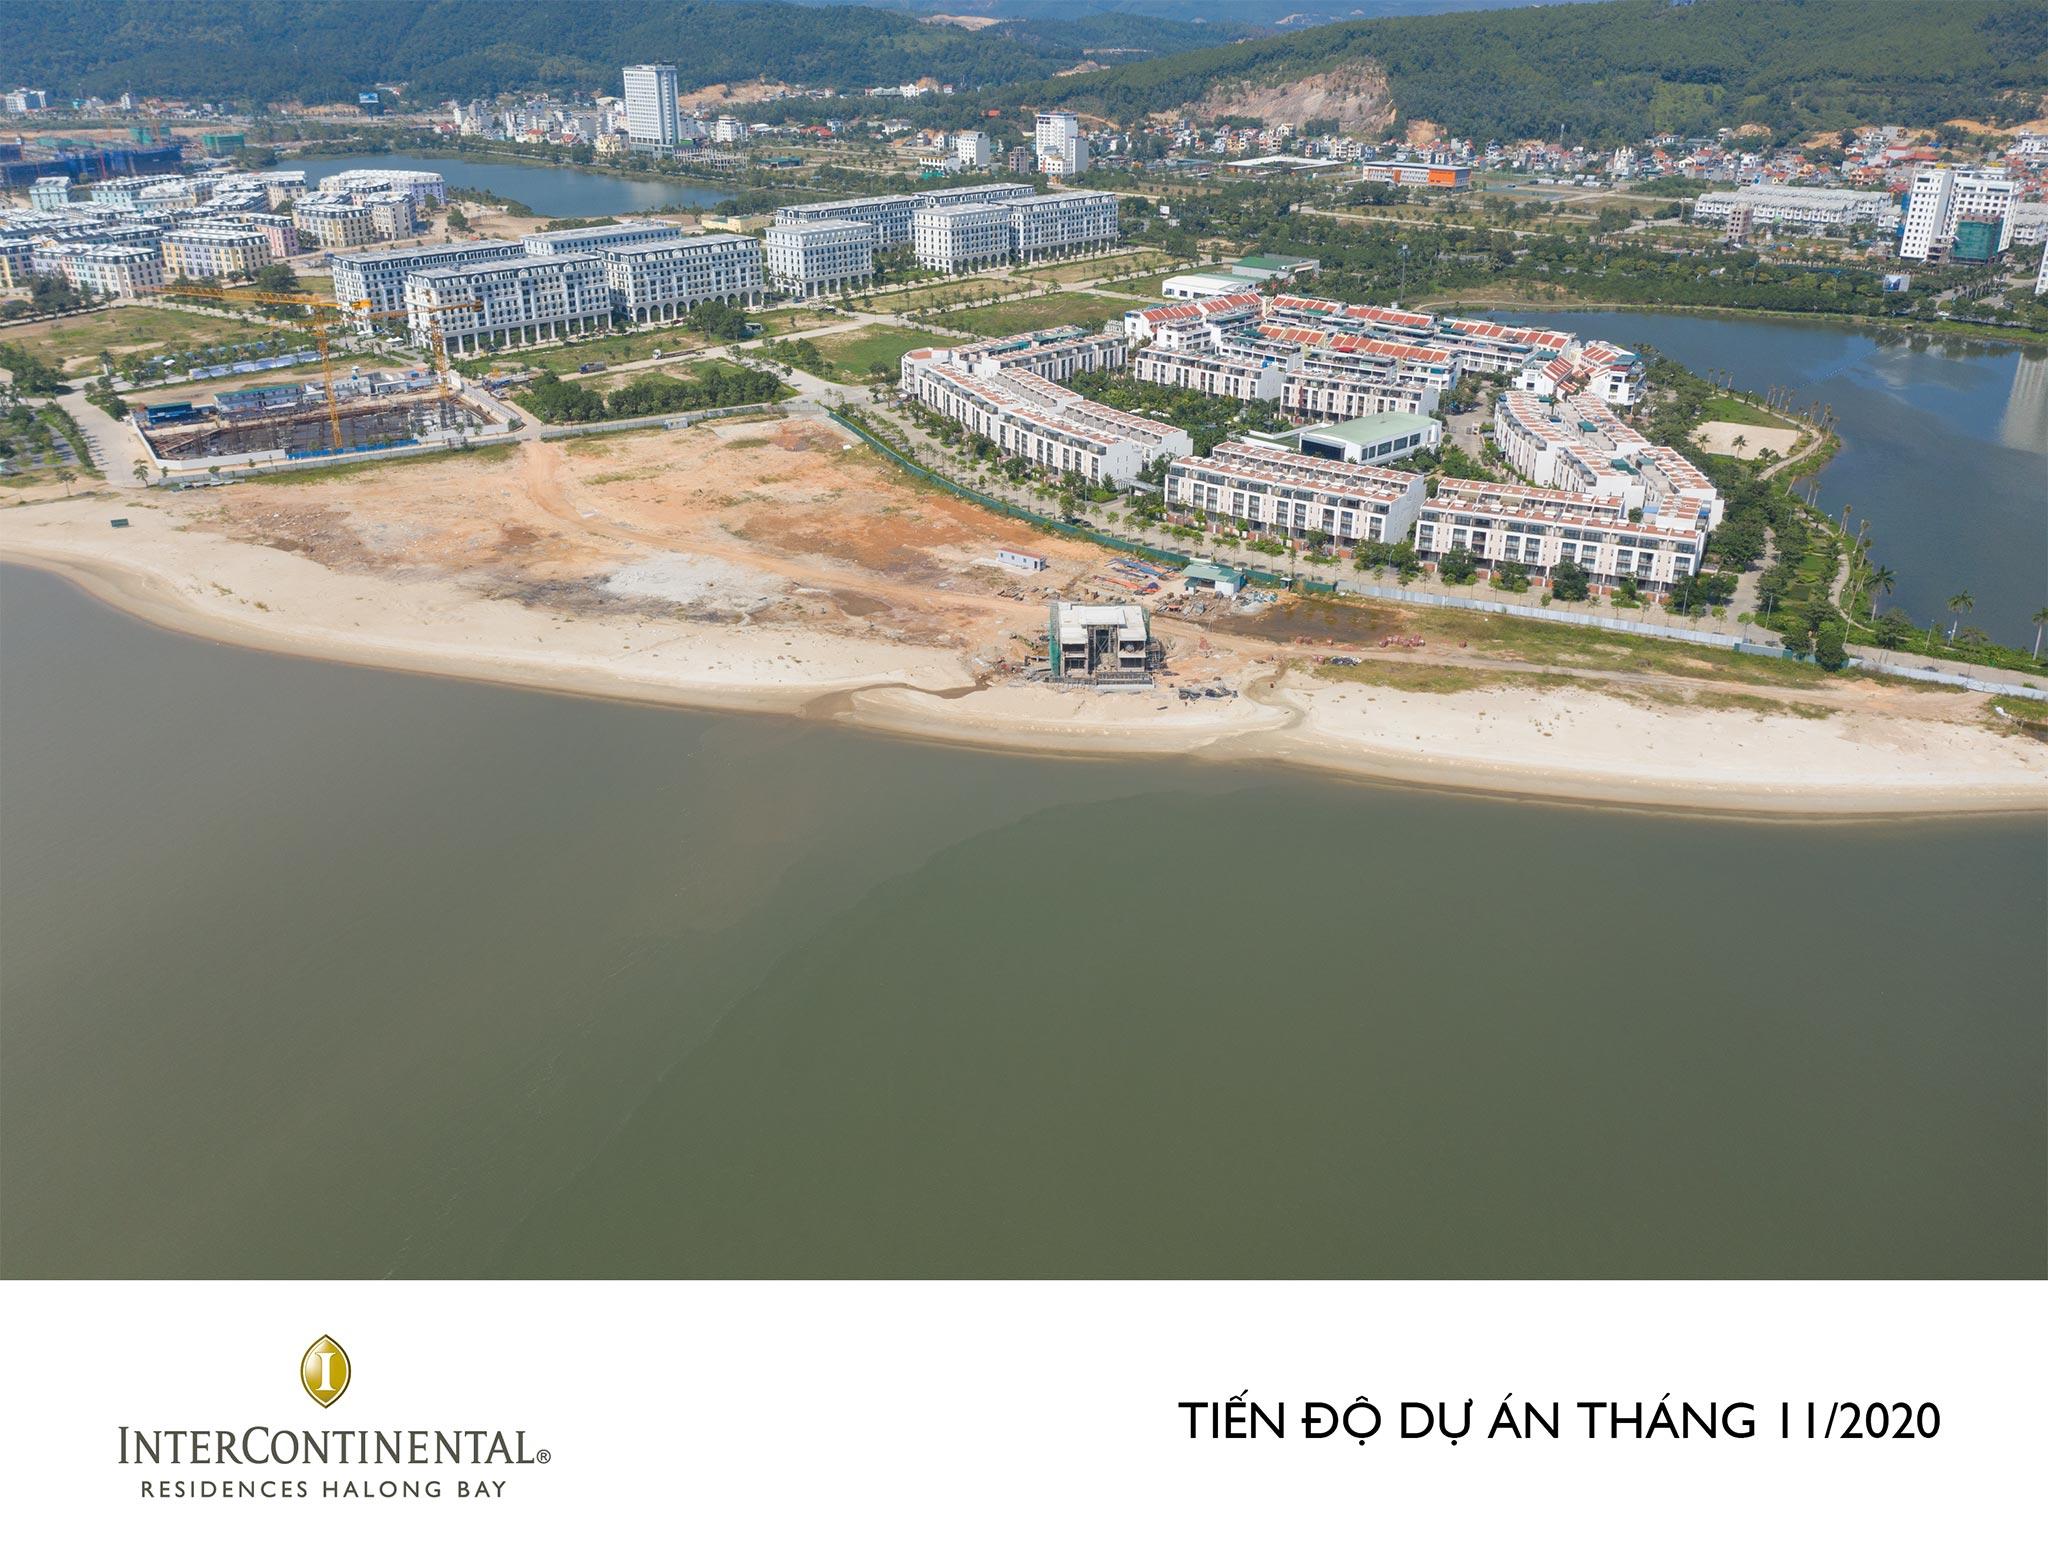 Tien do InterContinental Residences Halong Bay 11.2020 5